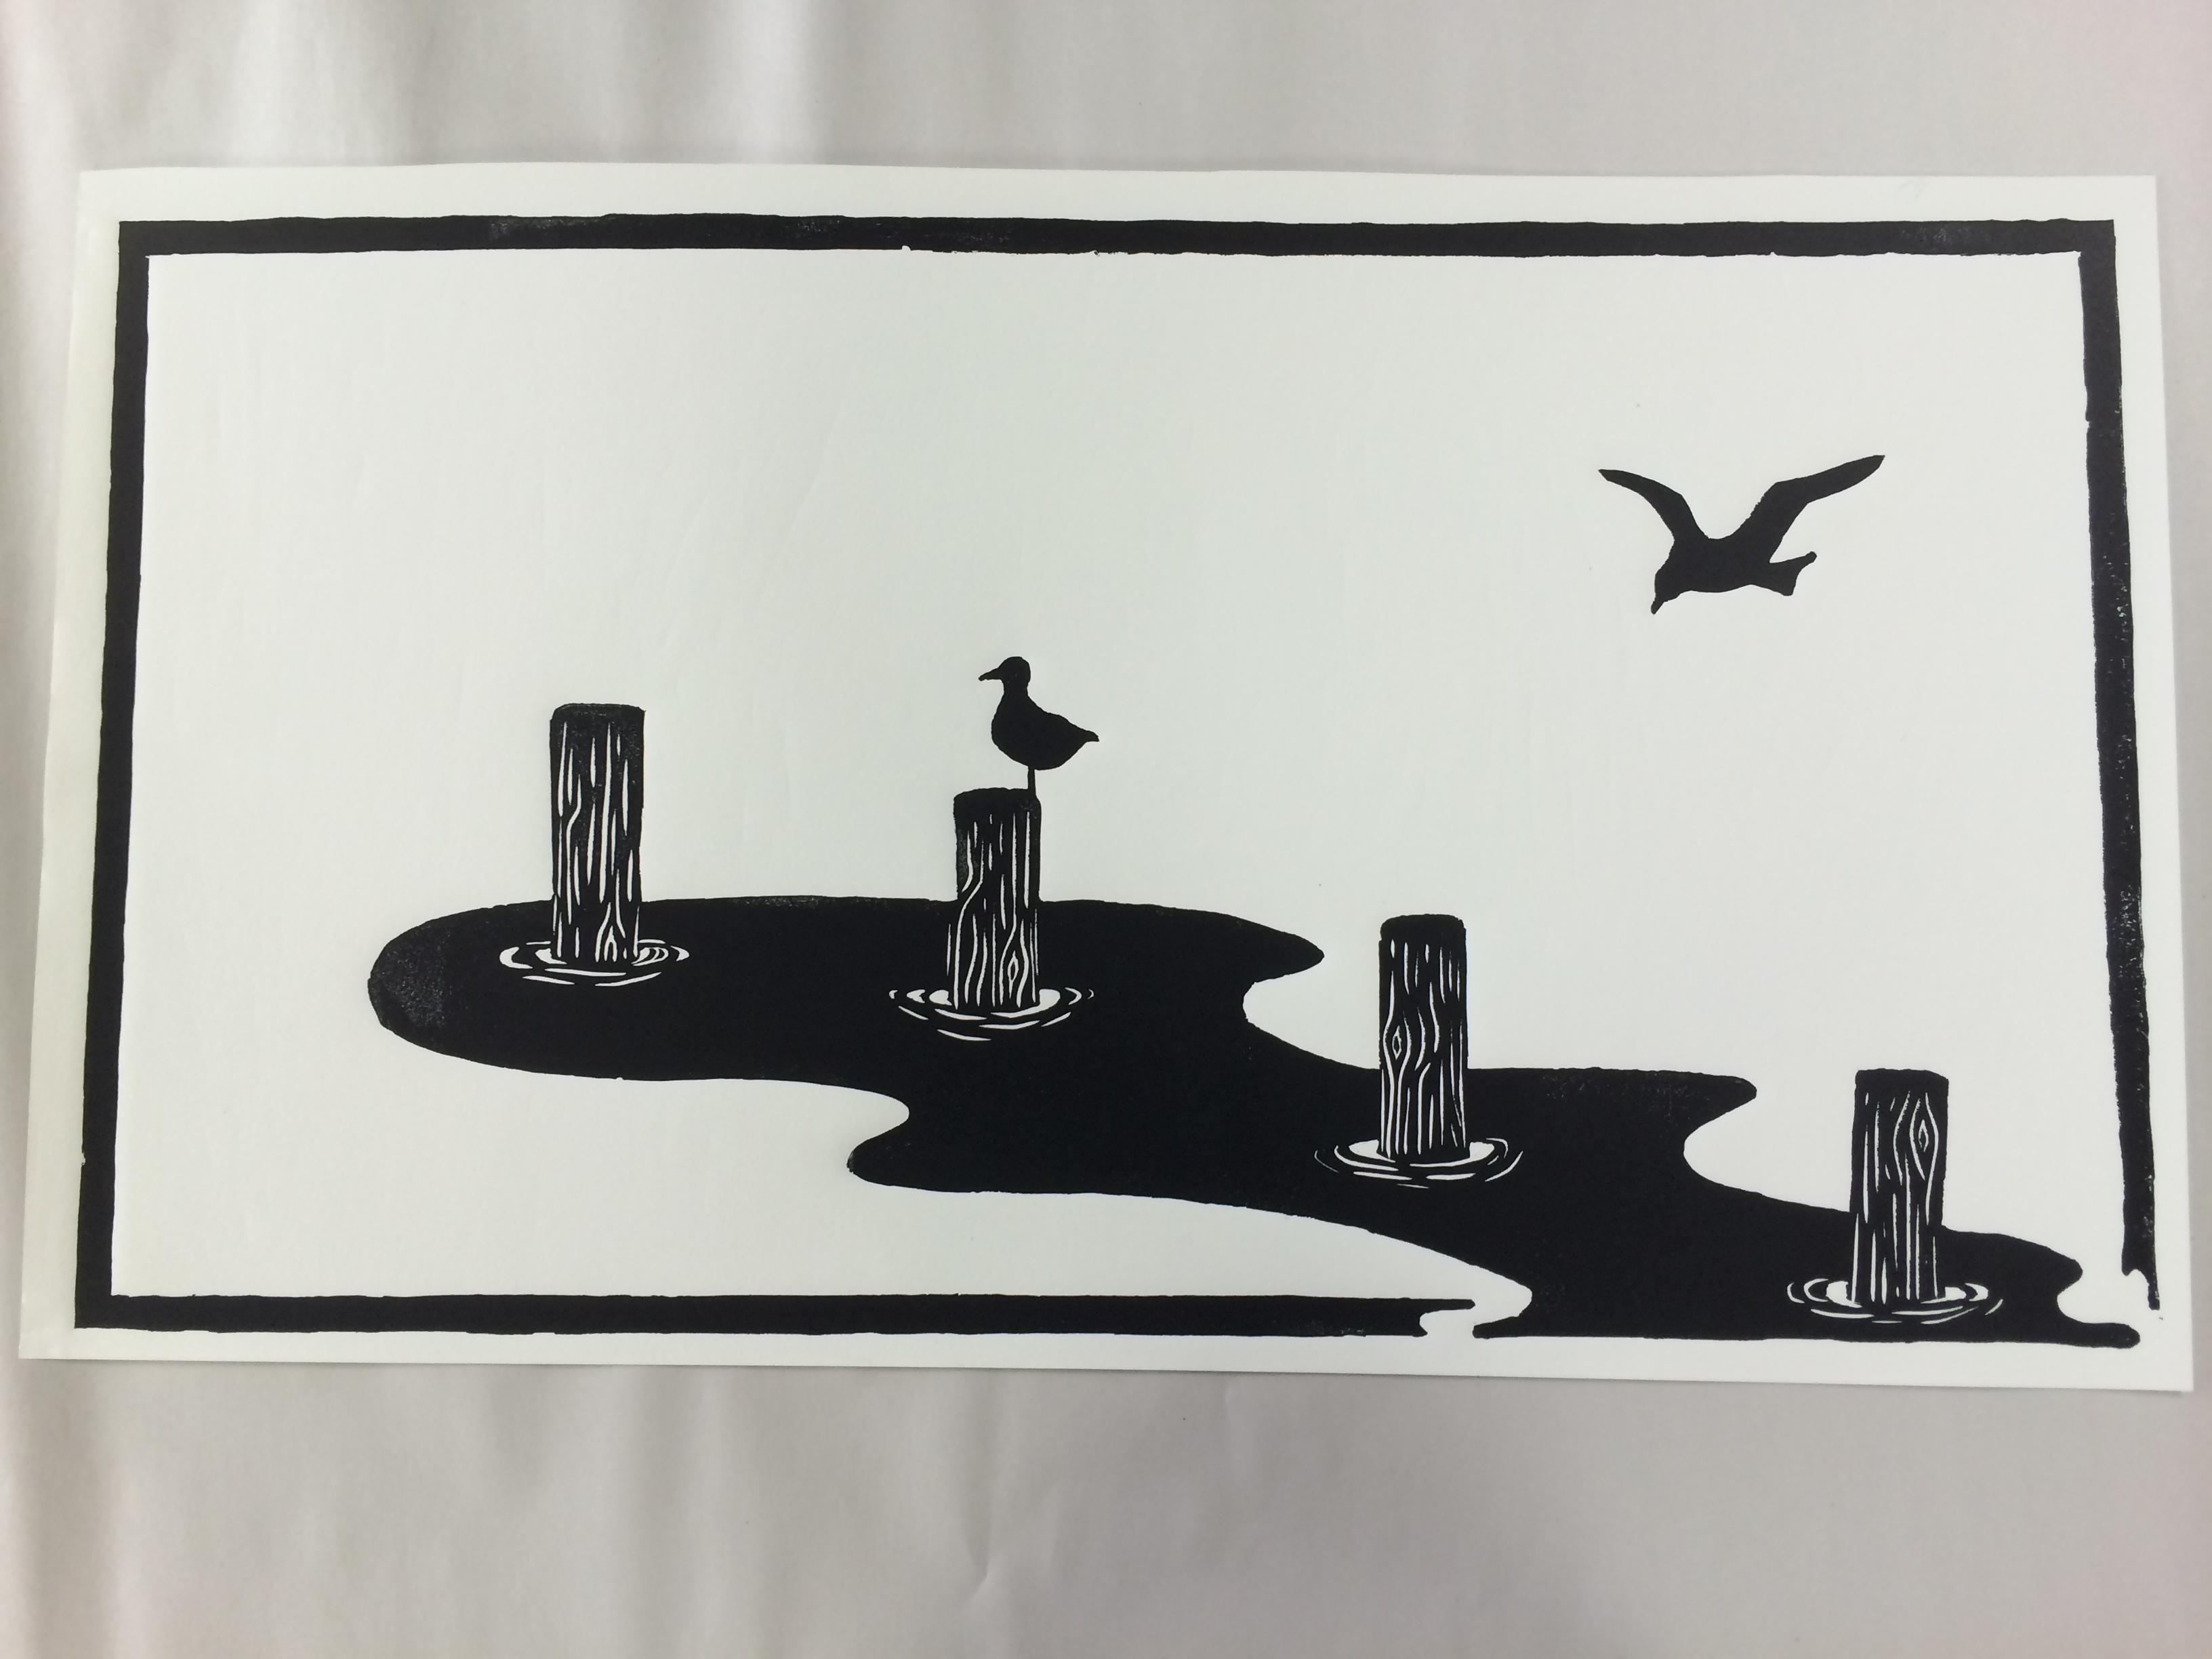 My final 26.5x15 inch print!